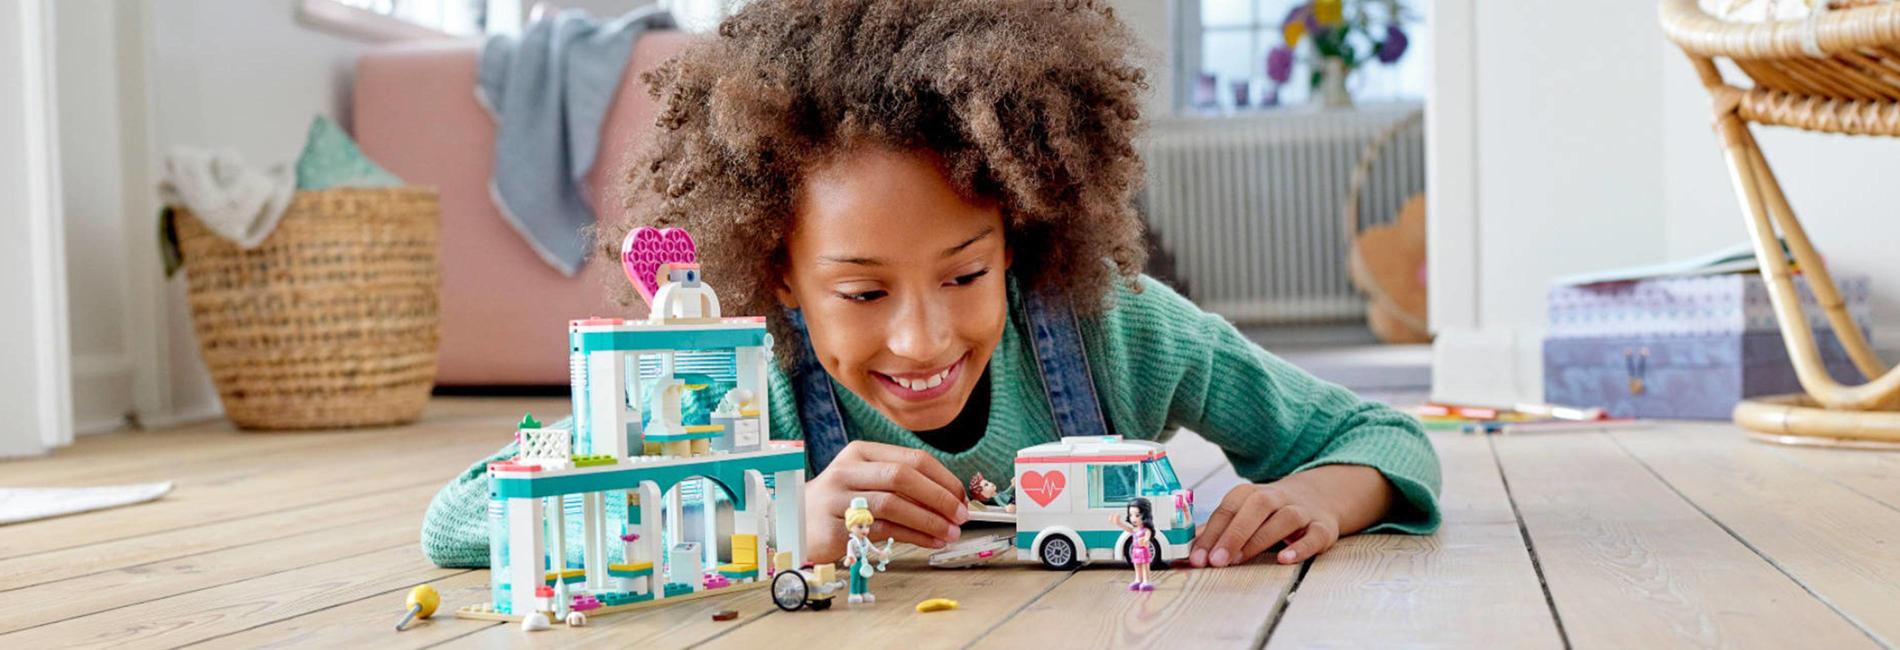 speelgoed wk 41 - LEGO Friends